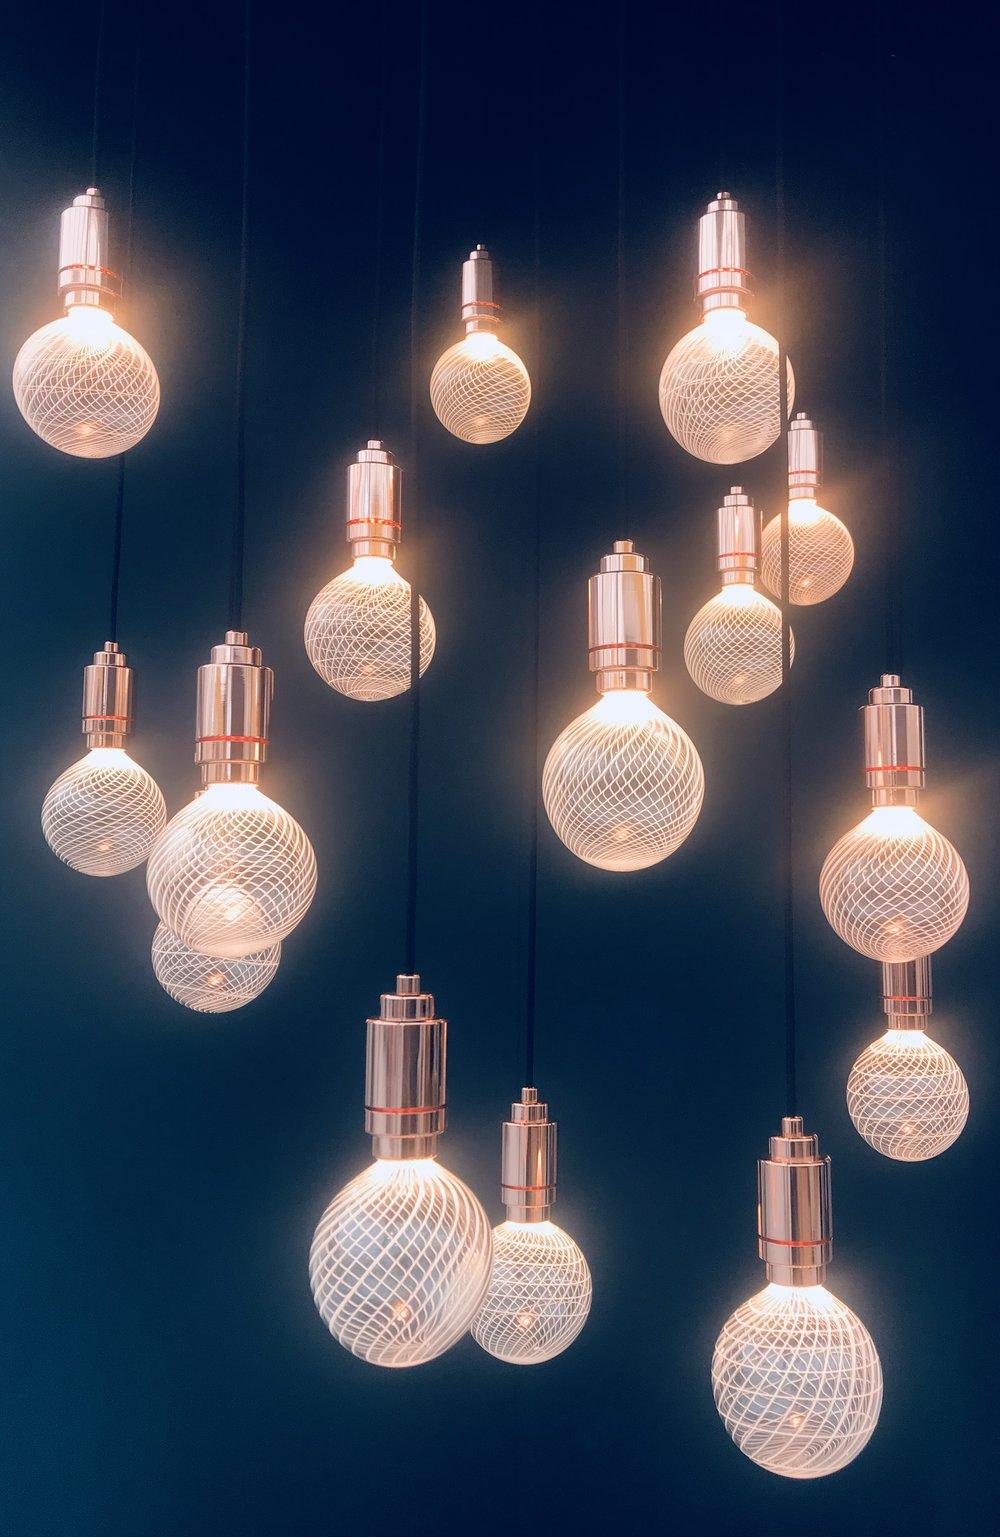 jonathan-rogers-glass-decorex-lauraloves-design.jpg